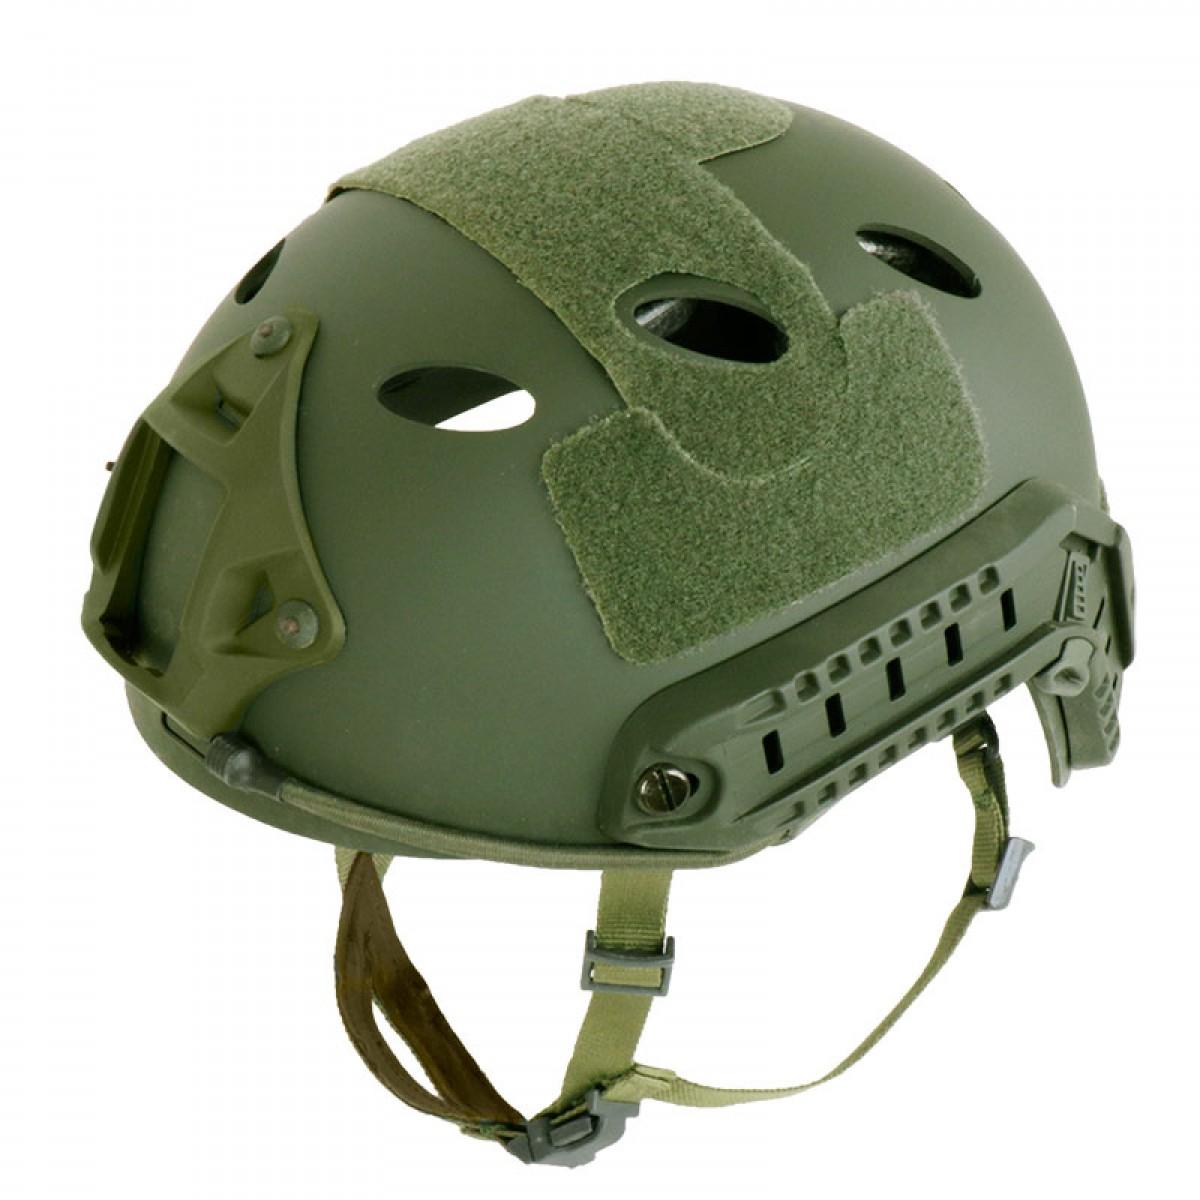 SHENKEL FAST HELMET ファストヘルメット PJタイプ 4点式あご紐ヘルメット  レプリカ 米軍装備 サバゲー BK/OD/TAN